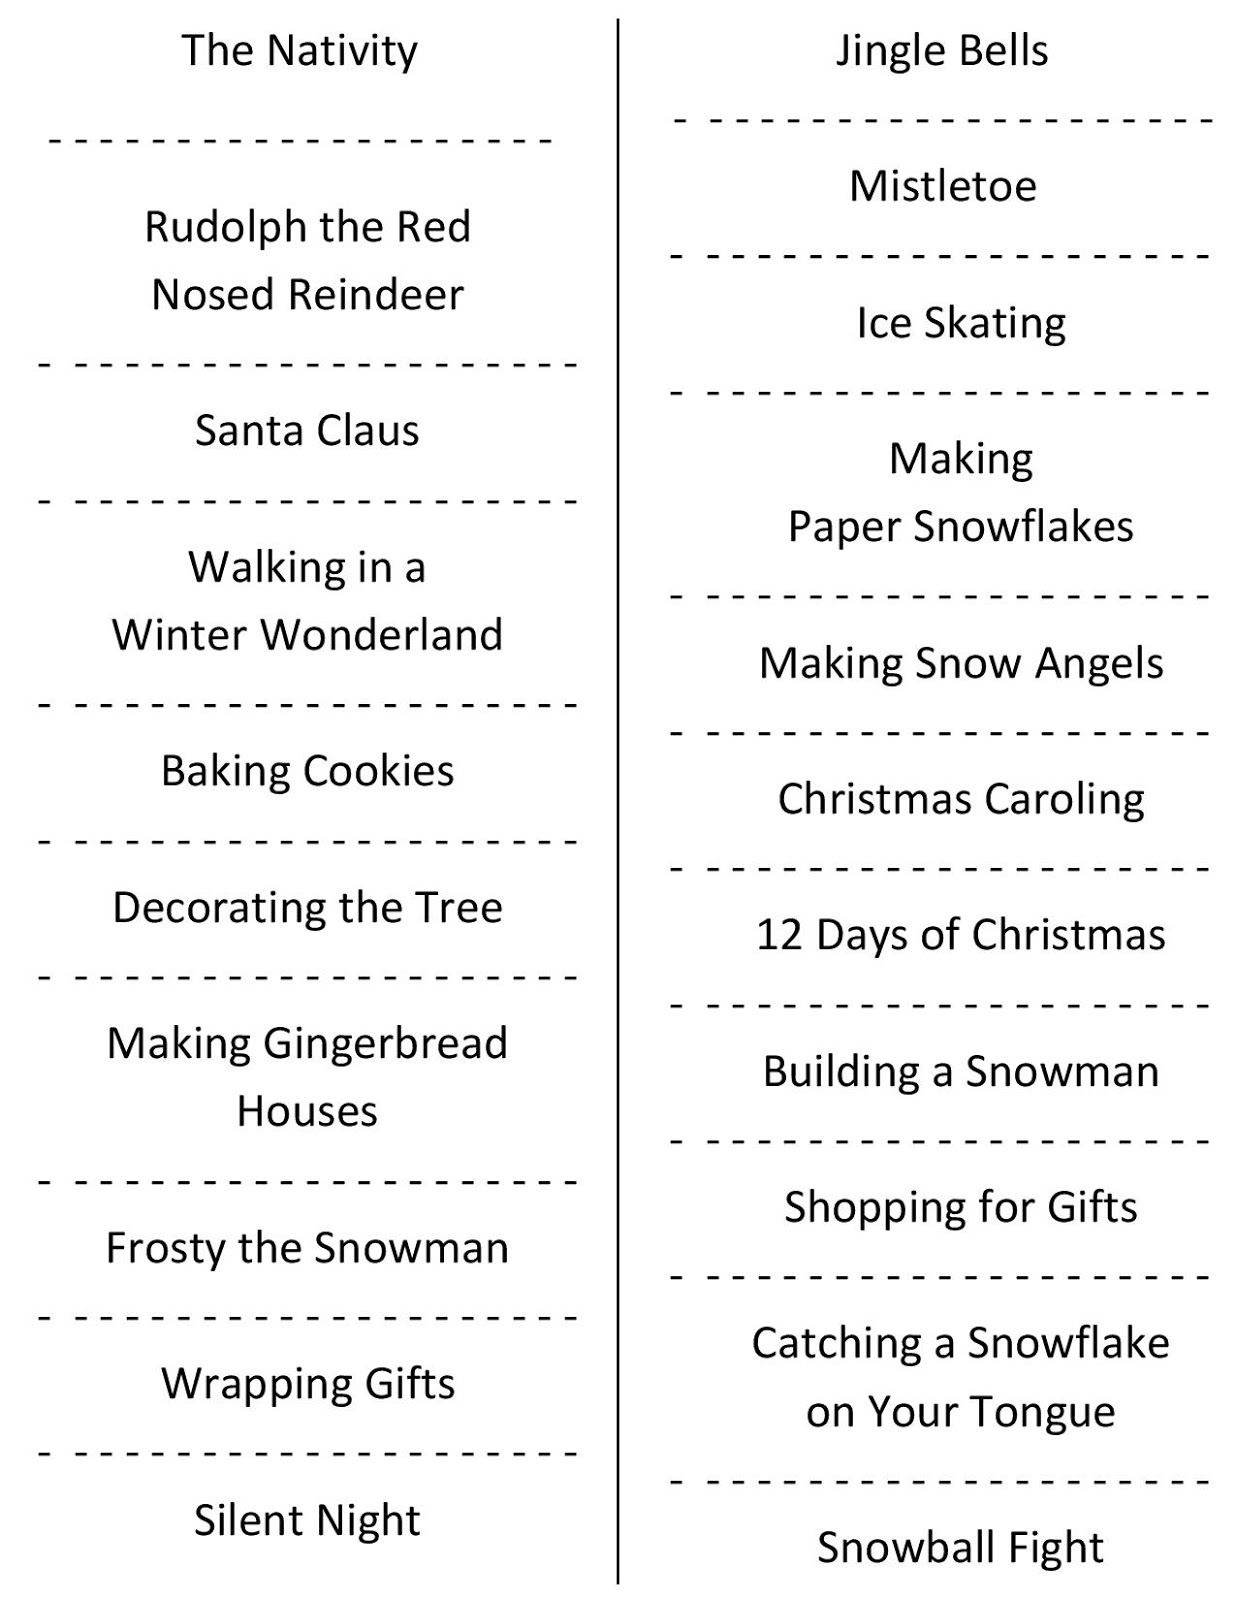 Christmas Charades (Free Printable Party Game) | Christmas | Daily - Free Printable Charades Cards